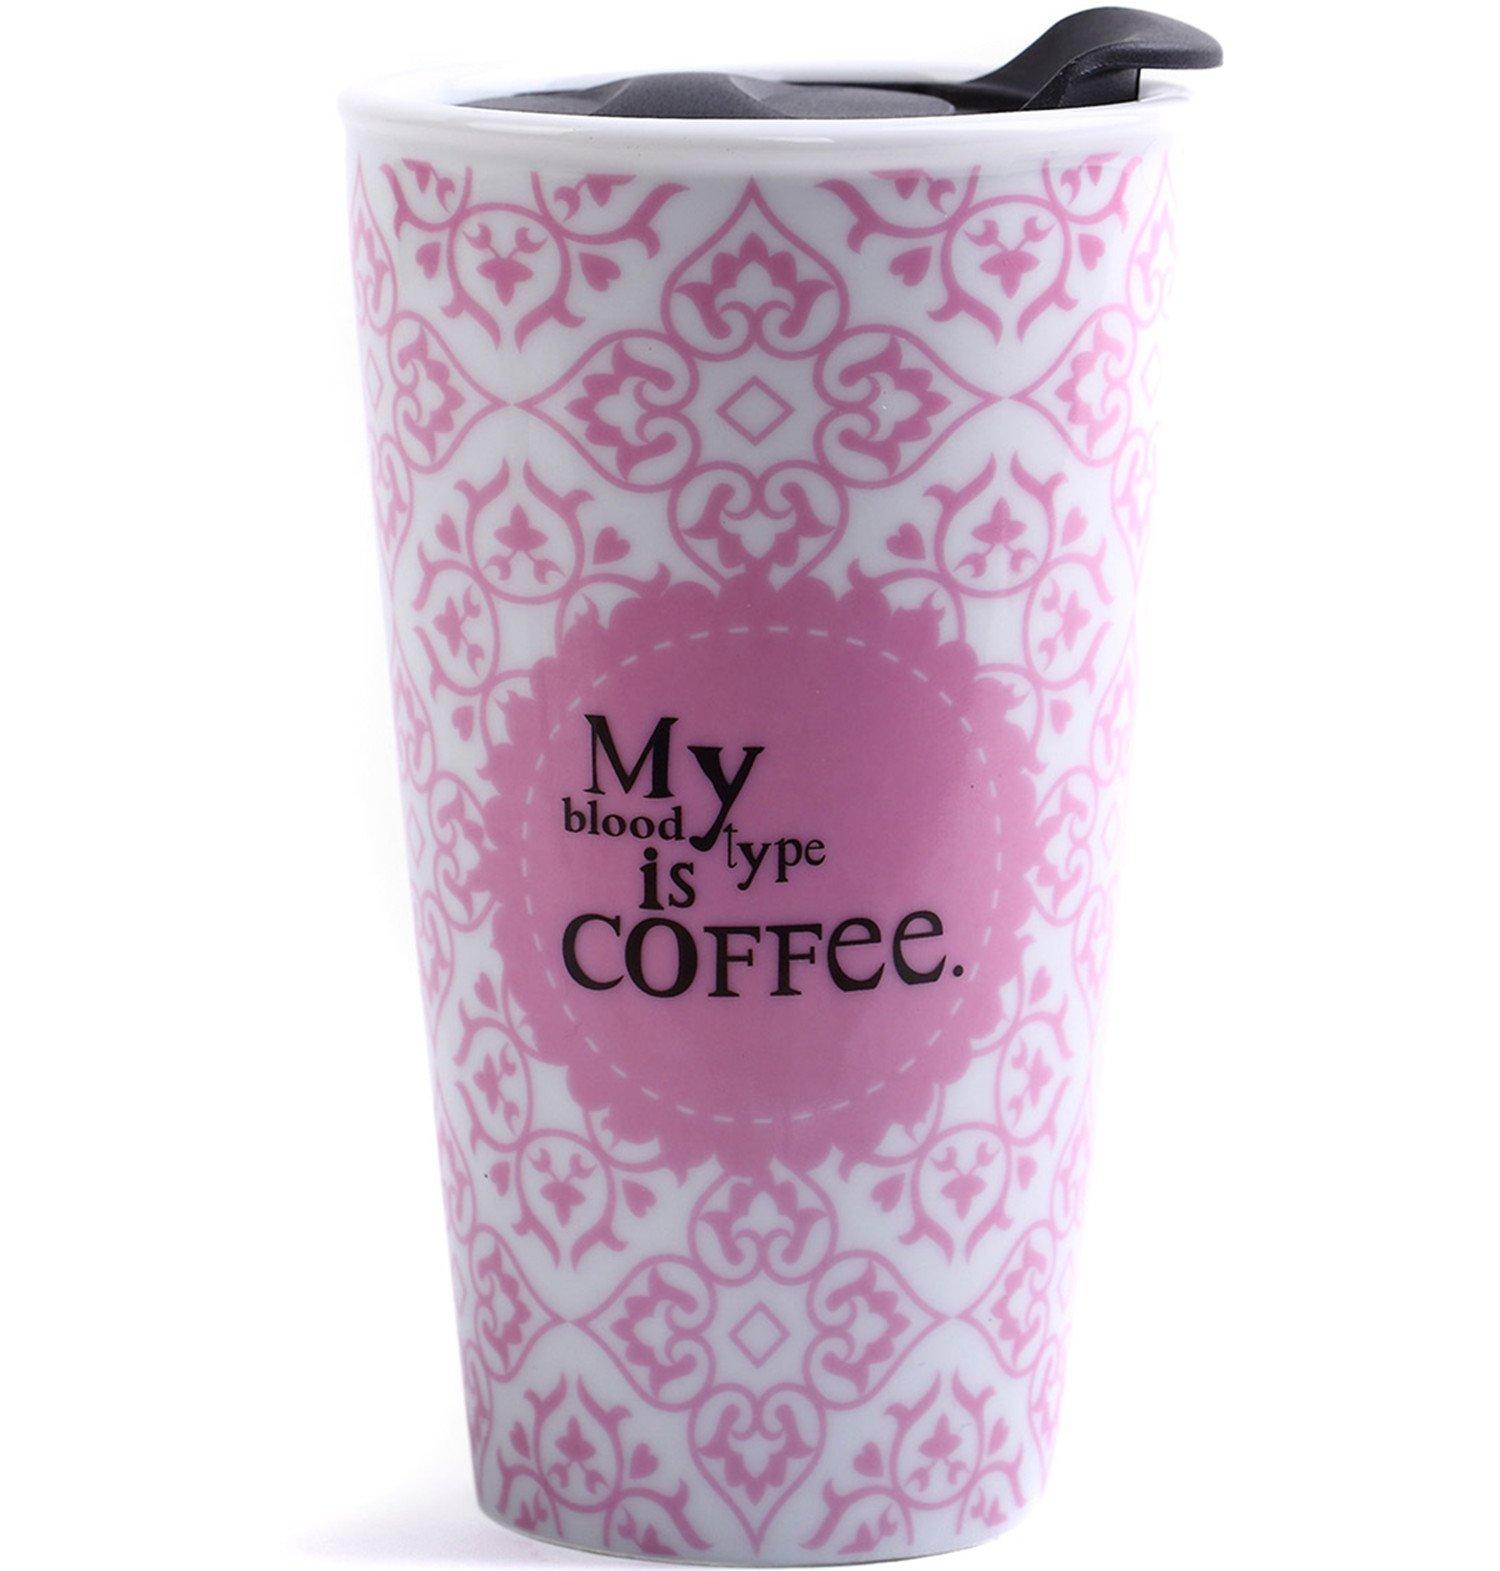 CEDAR HOME Travel Coffee Ceramic Mug Tea Cup Double Wall Porcelain With Lid 11oz., Pink